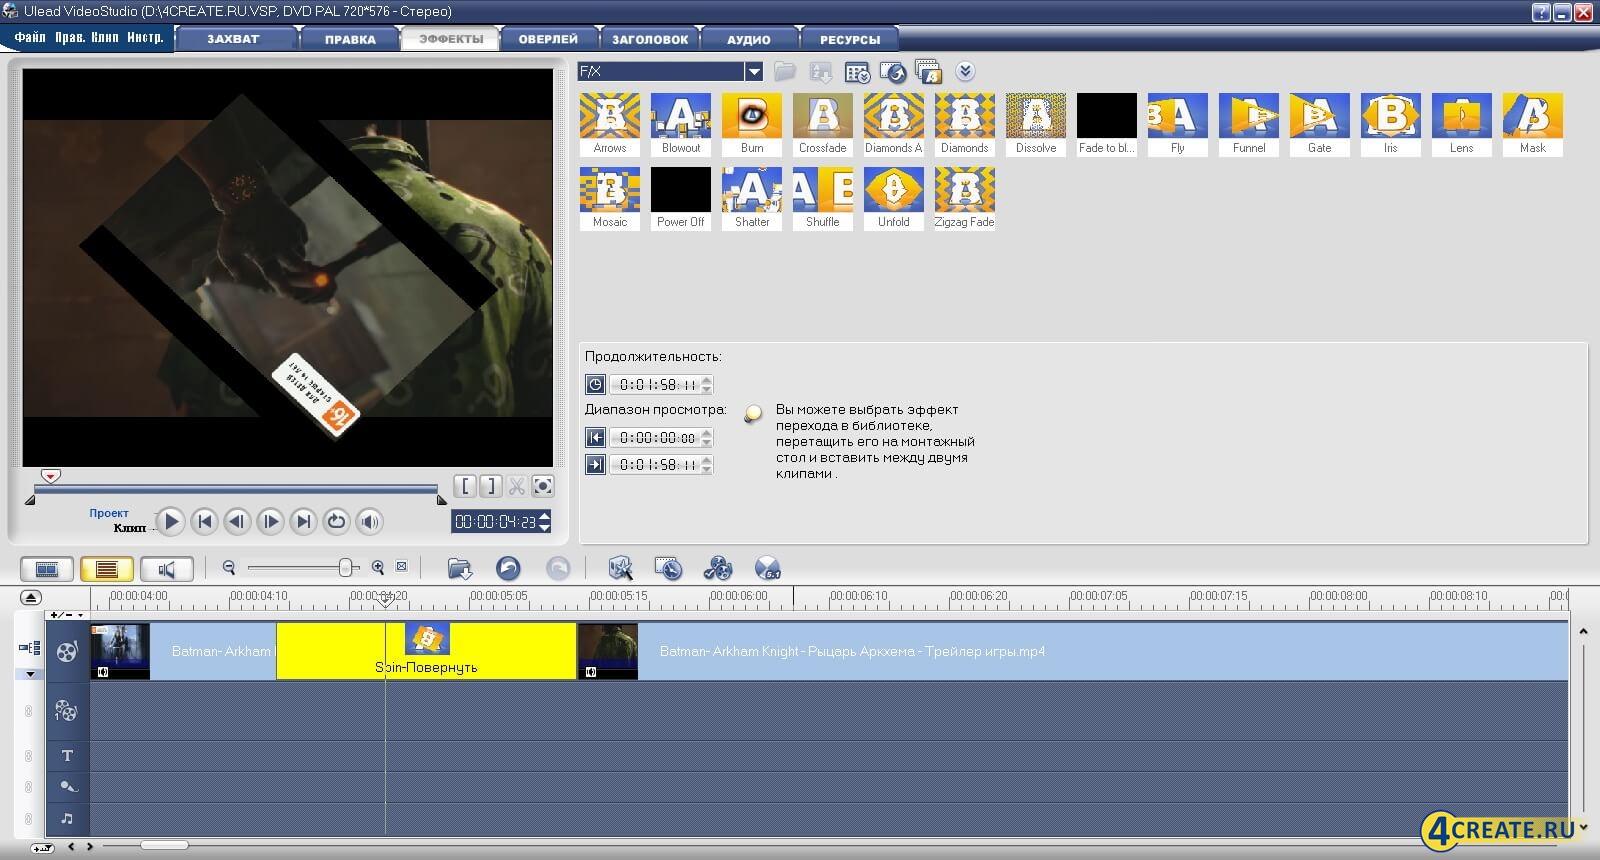 Ulead VideoStudio 11.5 (Скриншот 1)